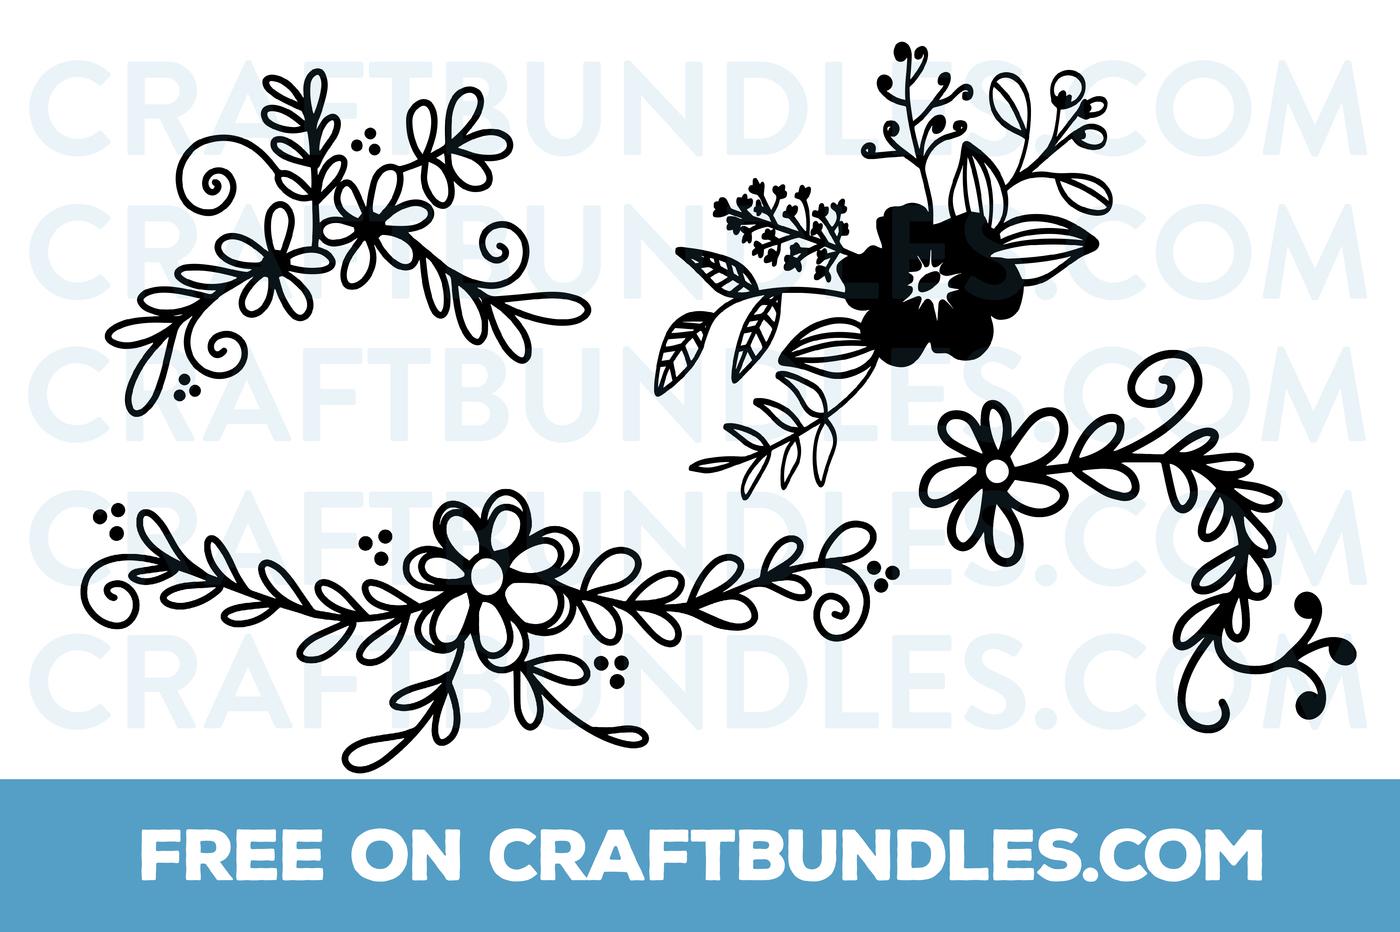 Free svg clipart for cricut flowers black and white clip black and white download FREE Floral Doodles SVG Cut File by CraftBundles.com | CraftBundles clip black and white download